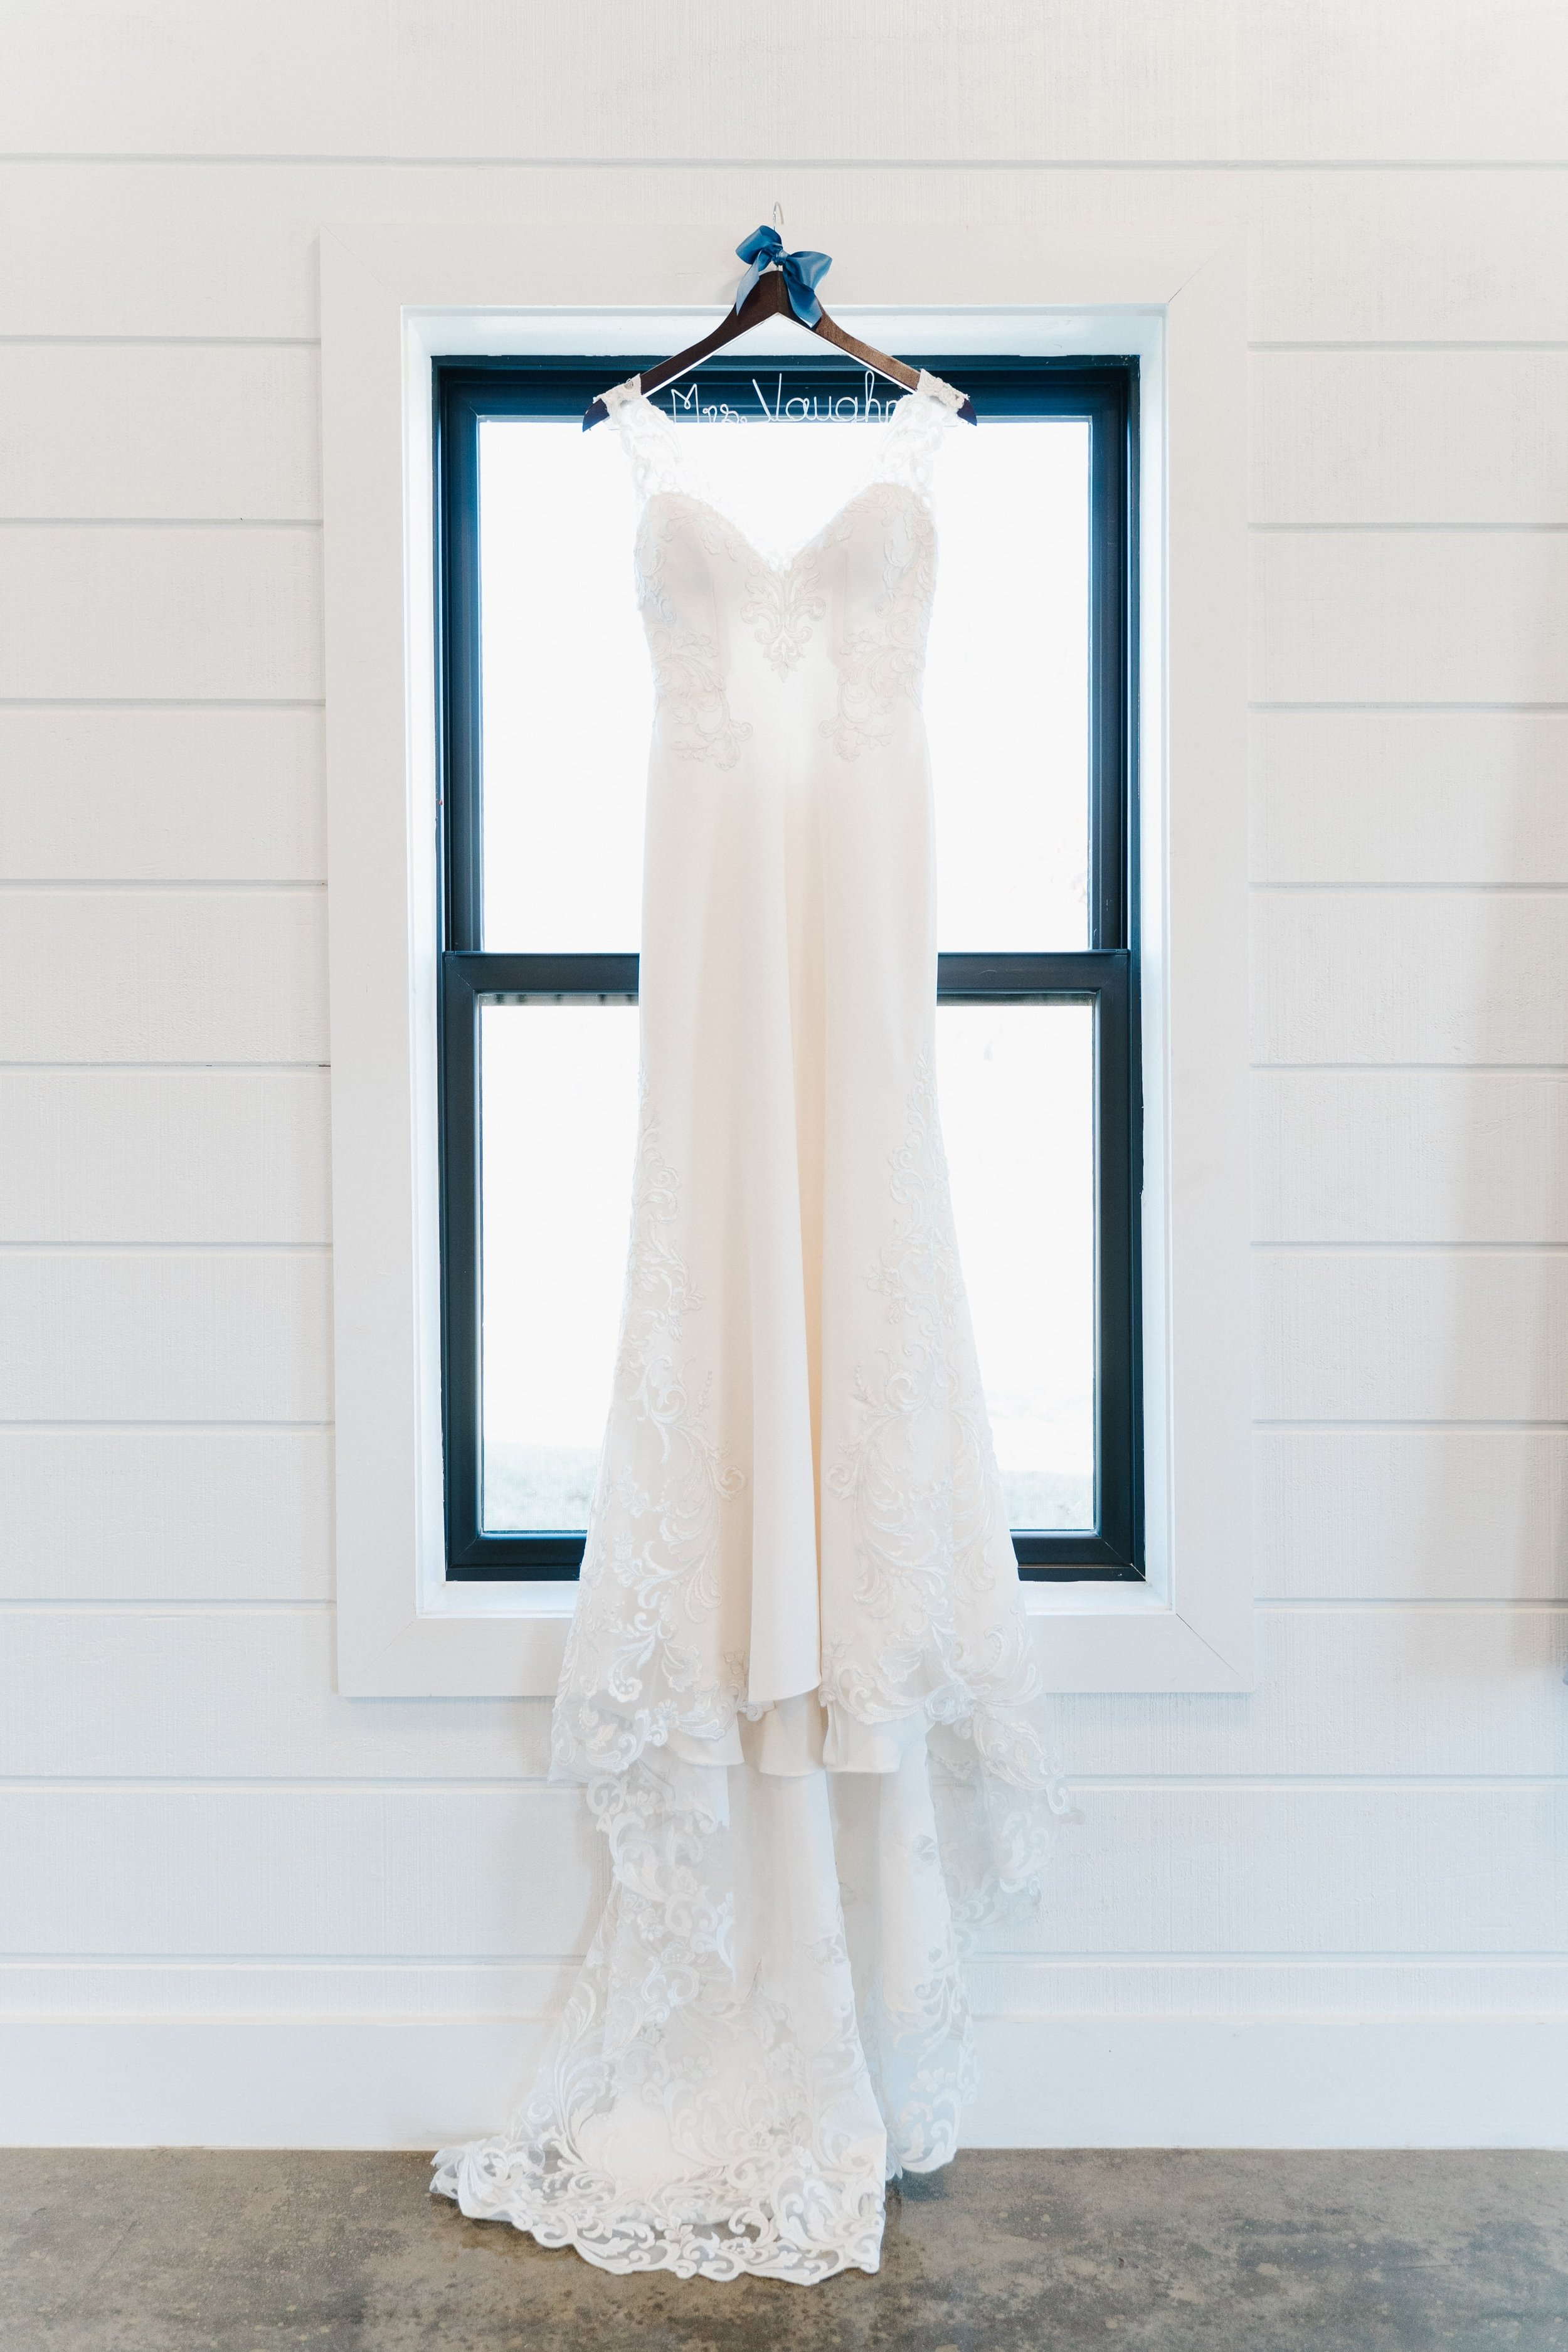 Tulsa Wedding Venues White Barn 0.jpg